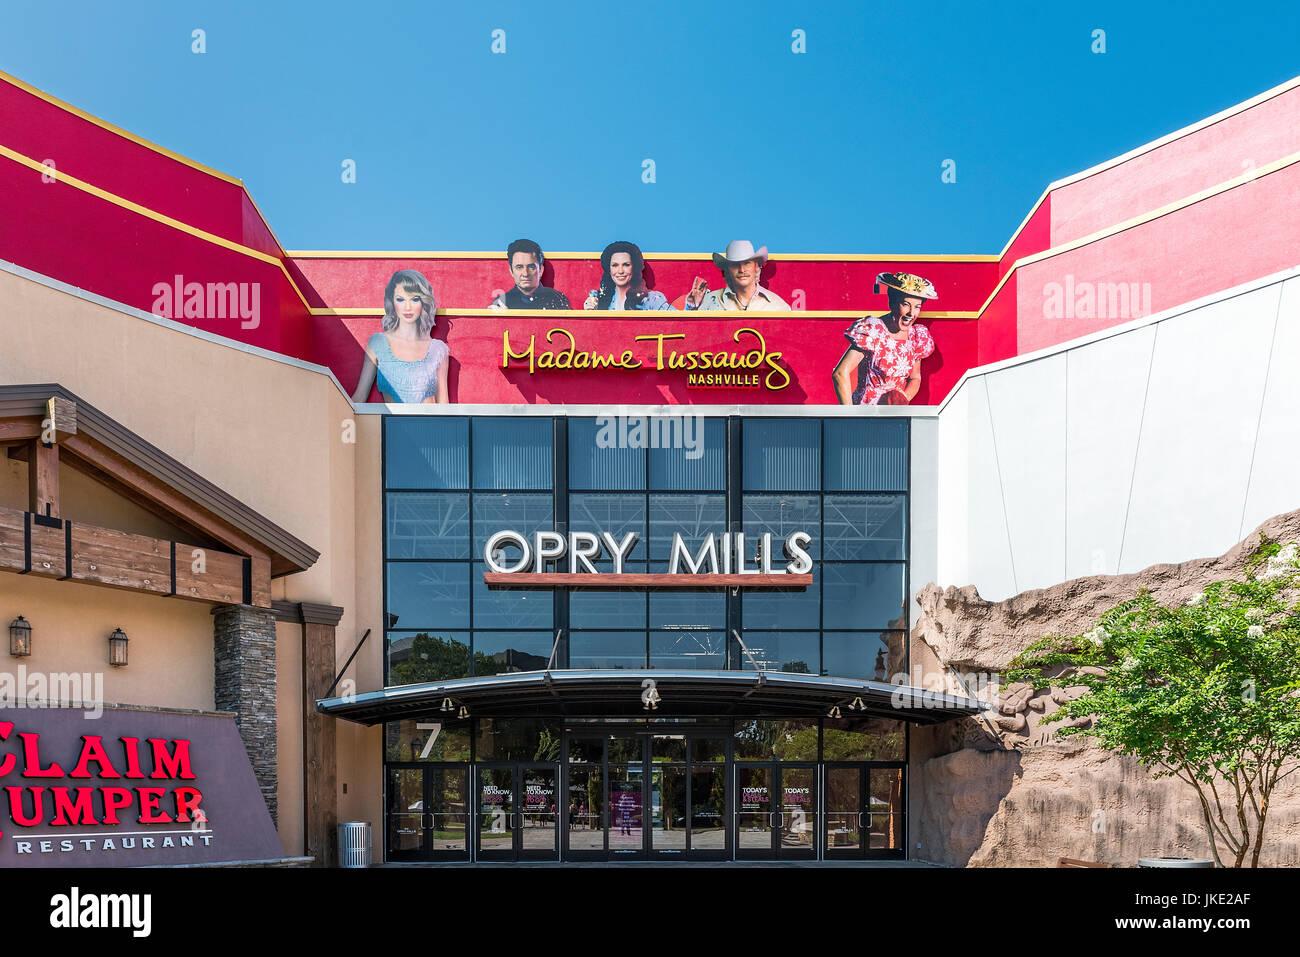 Opry Mills Mall, Nashville, Tennessee, USA. - Stock Image